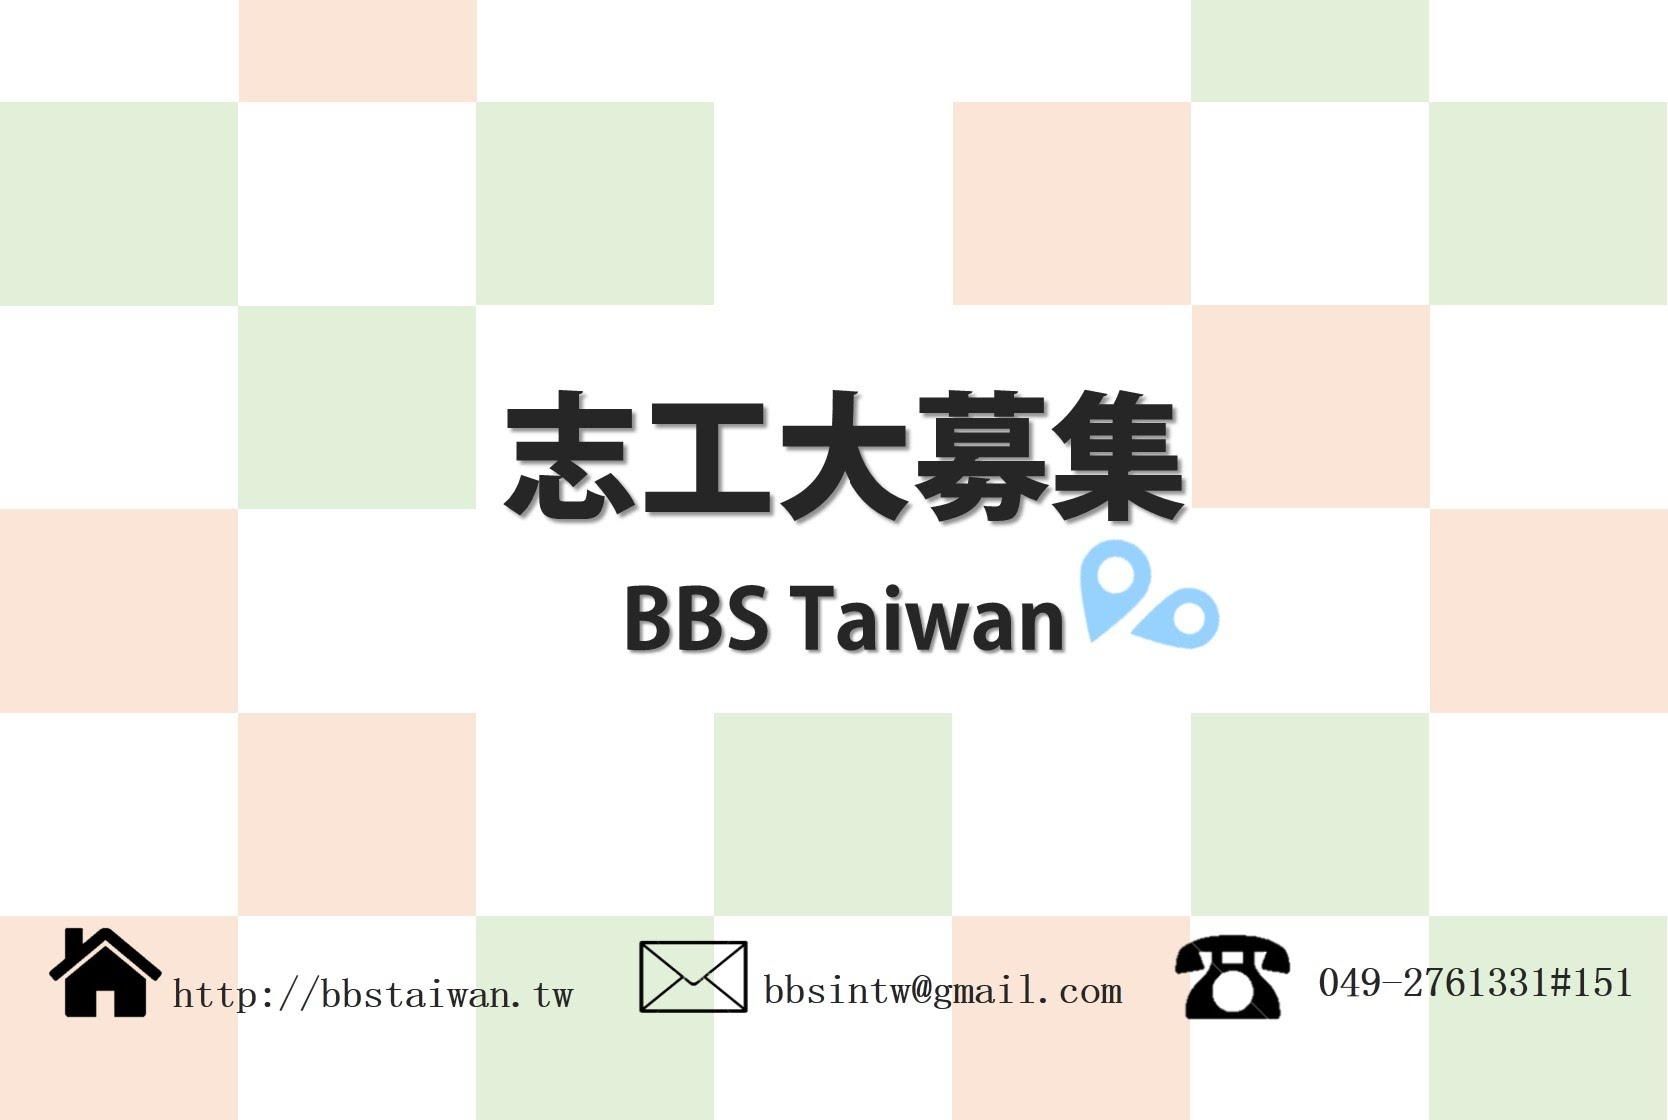 https://www.facebook.com/pg/bbstaiwan/photos/?tab=album&album_id=1002054106653086